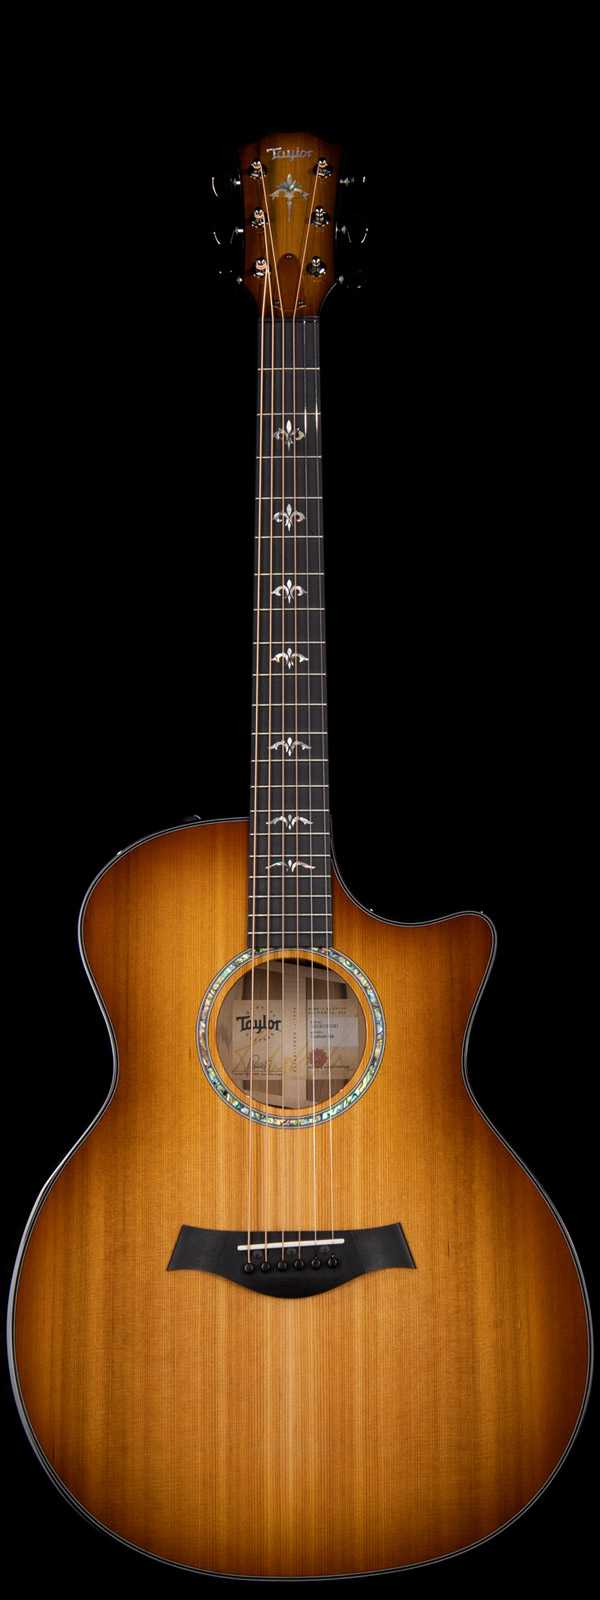 Taylor Custom Grand Auditorium Blackheart Sassafras Acoustic Electric Shaded Edgeburst